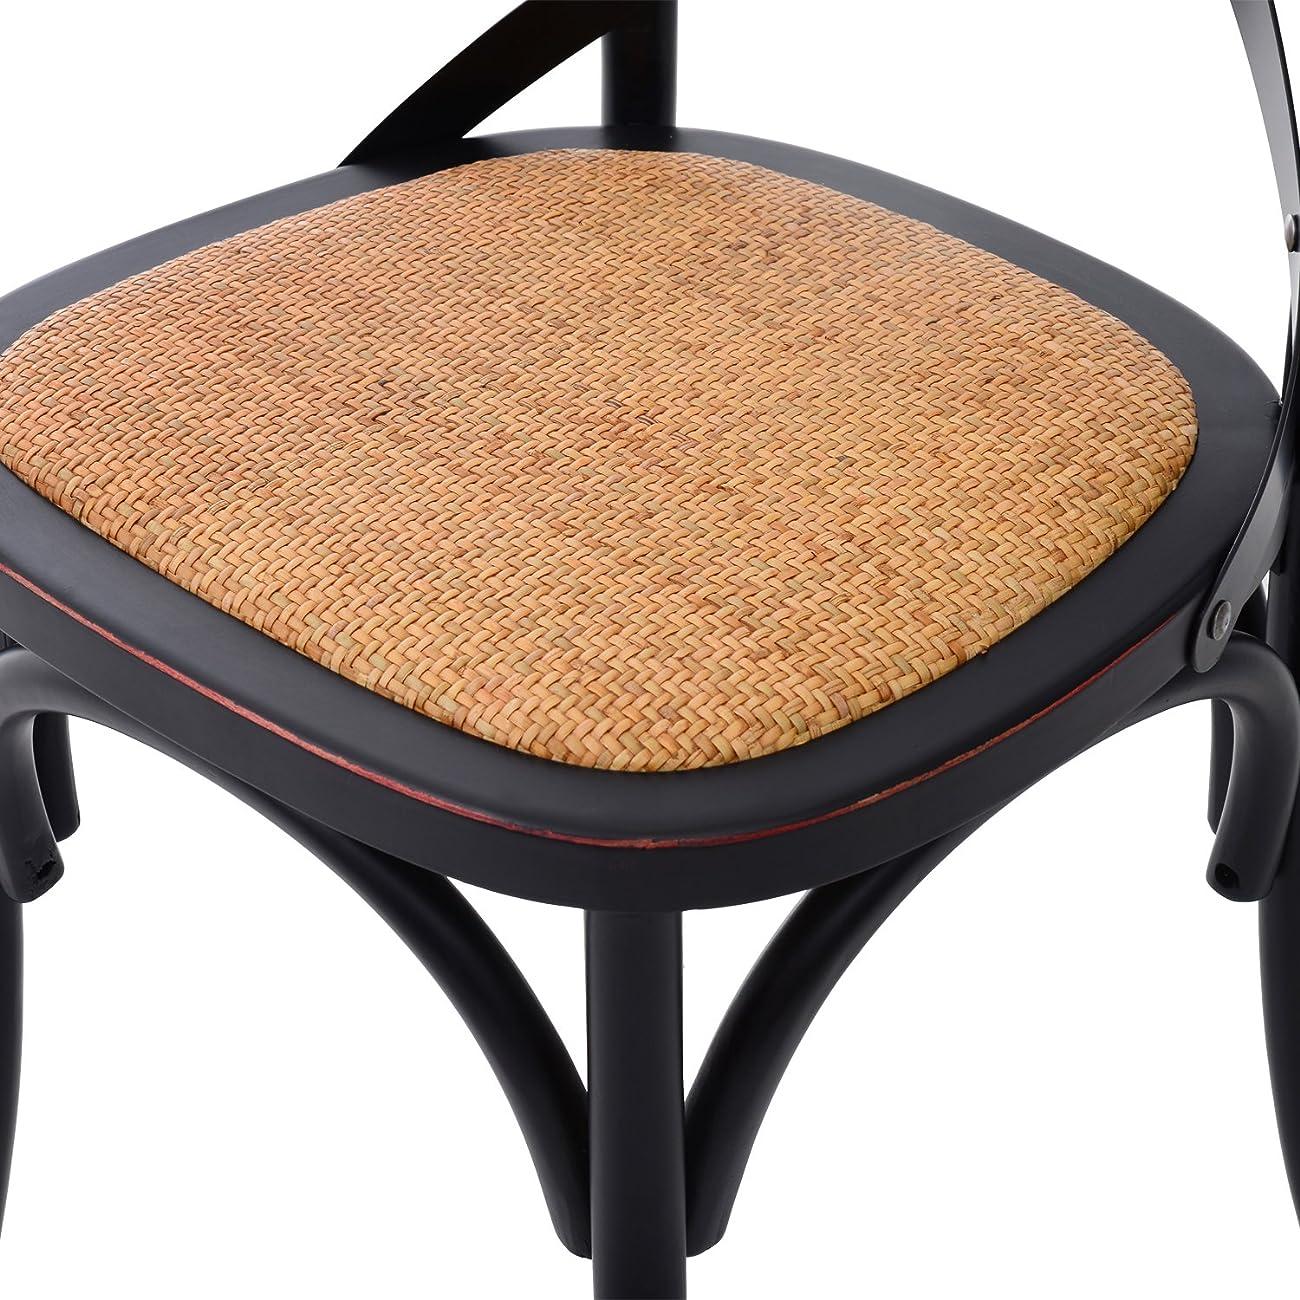 HomCom Vintage-Style X Back Elm Wood Dining Chair - Set of 2 (Black) 5